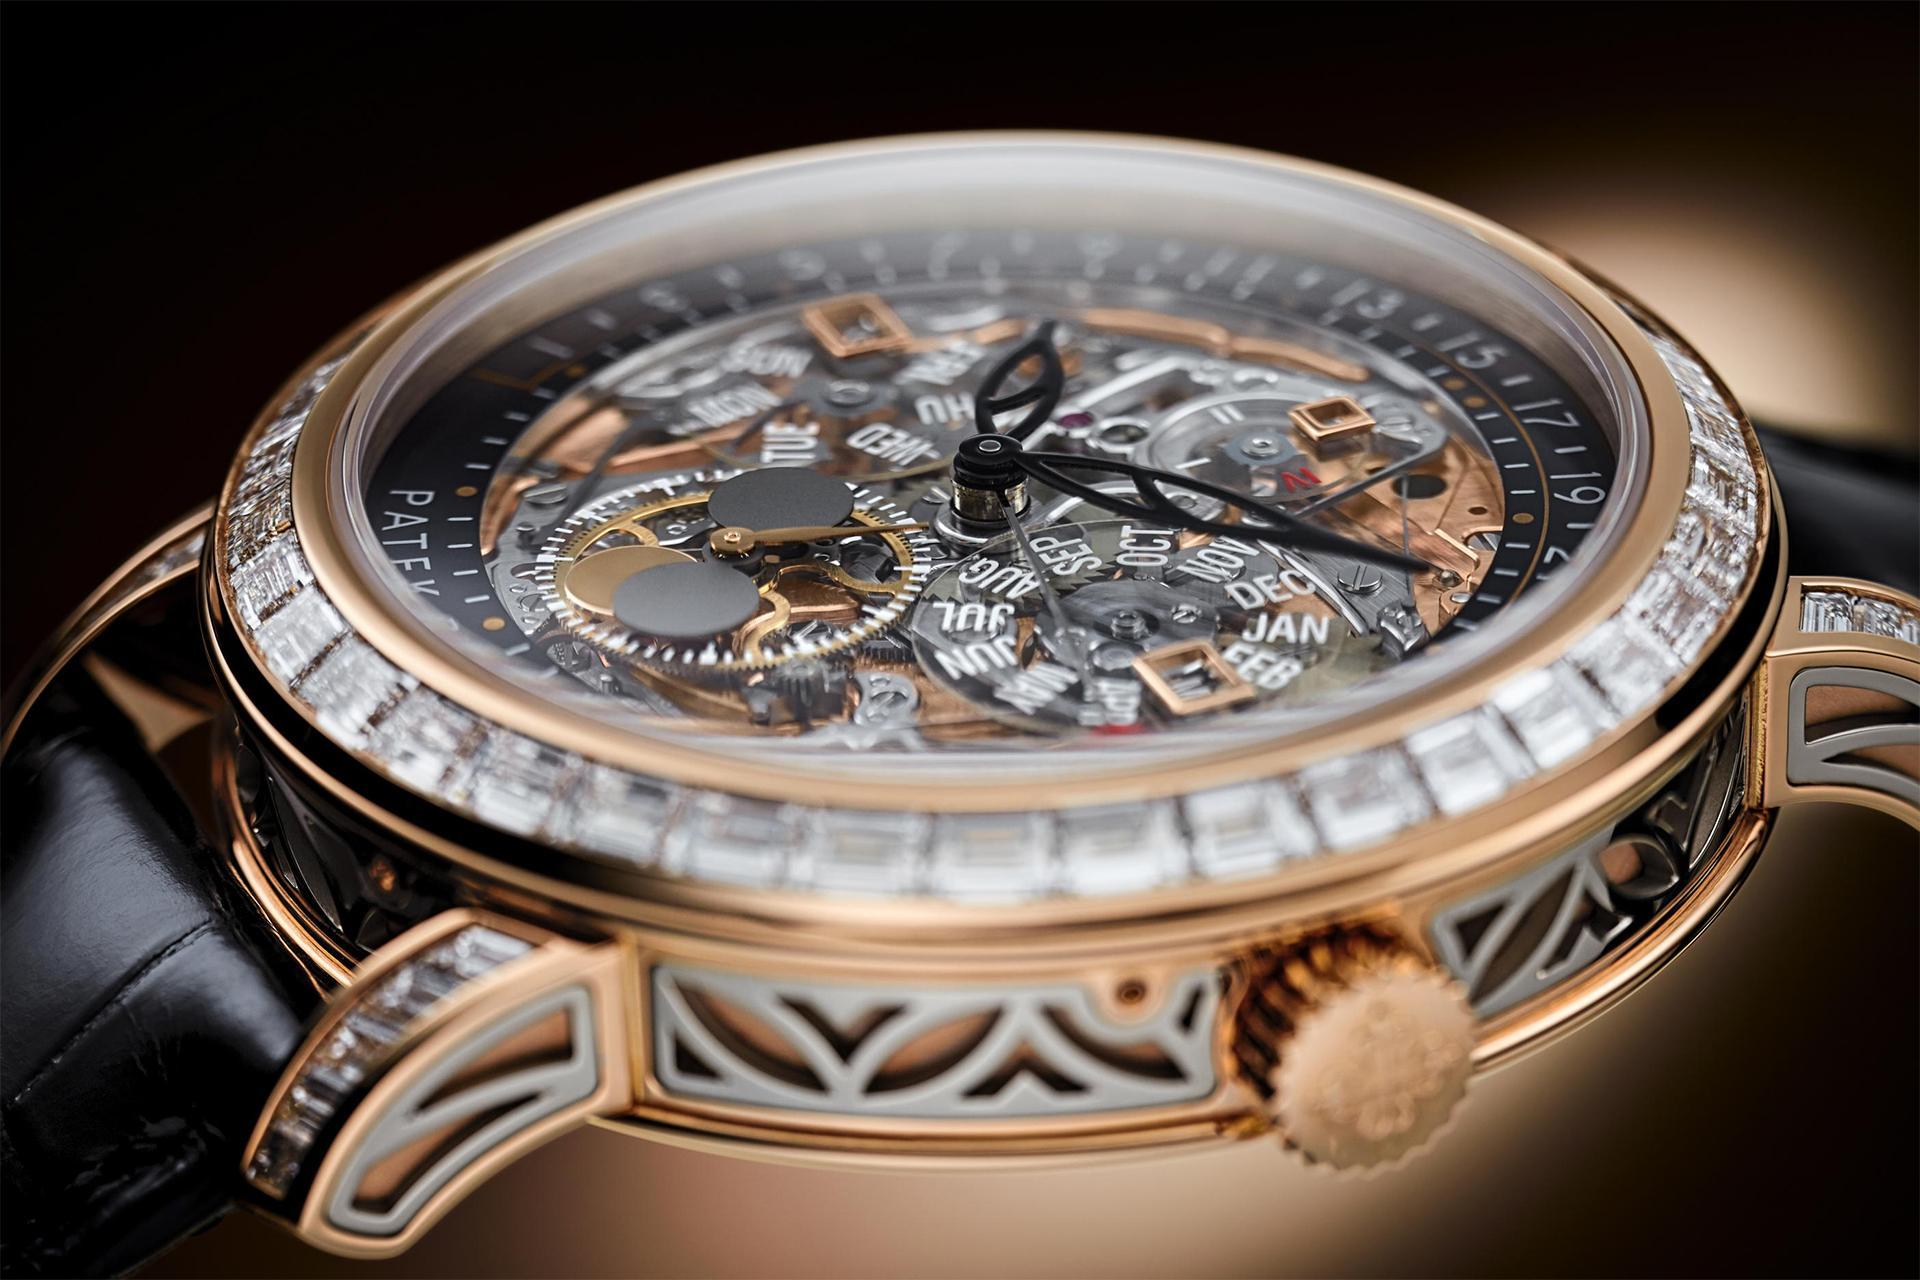 Patek Philippe Minute Repeater with Retrograde Perpetual Calendar Ref. 5304/301R-001 watch